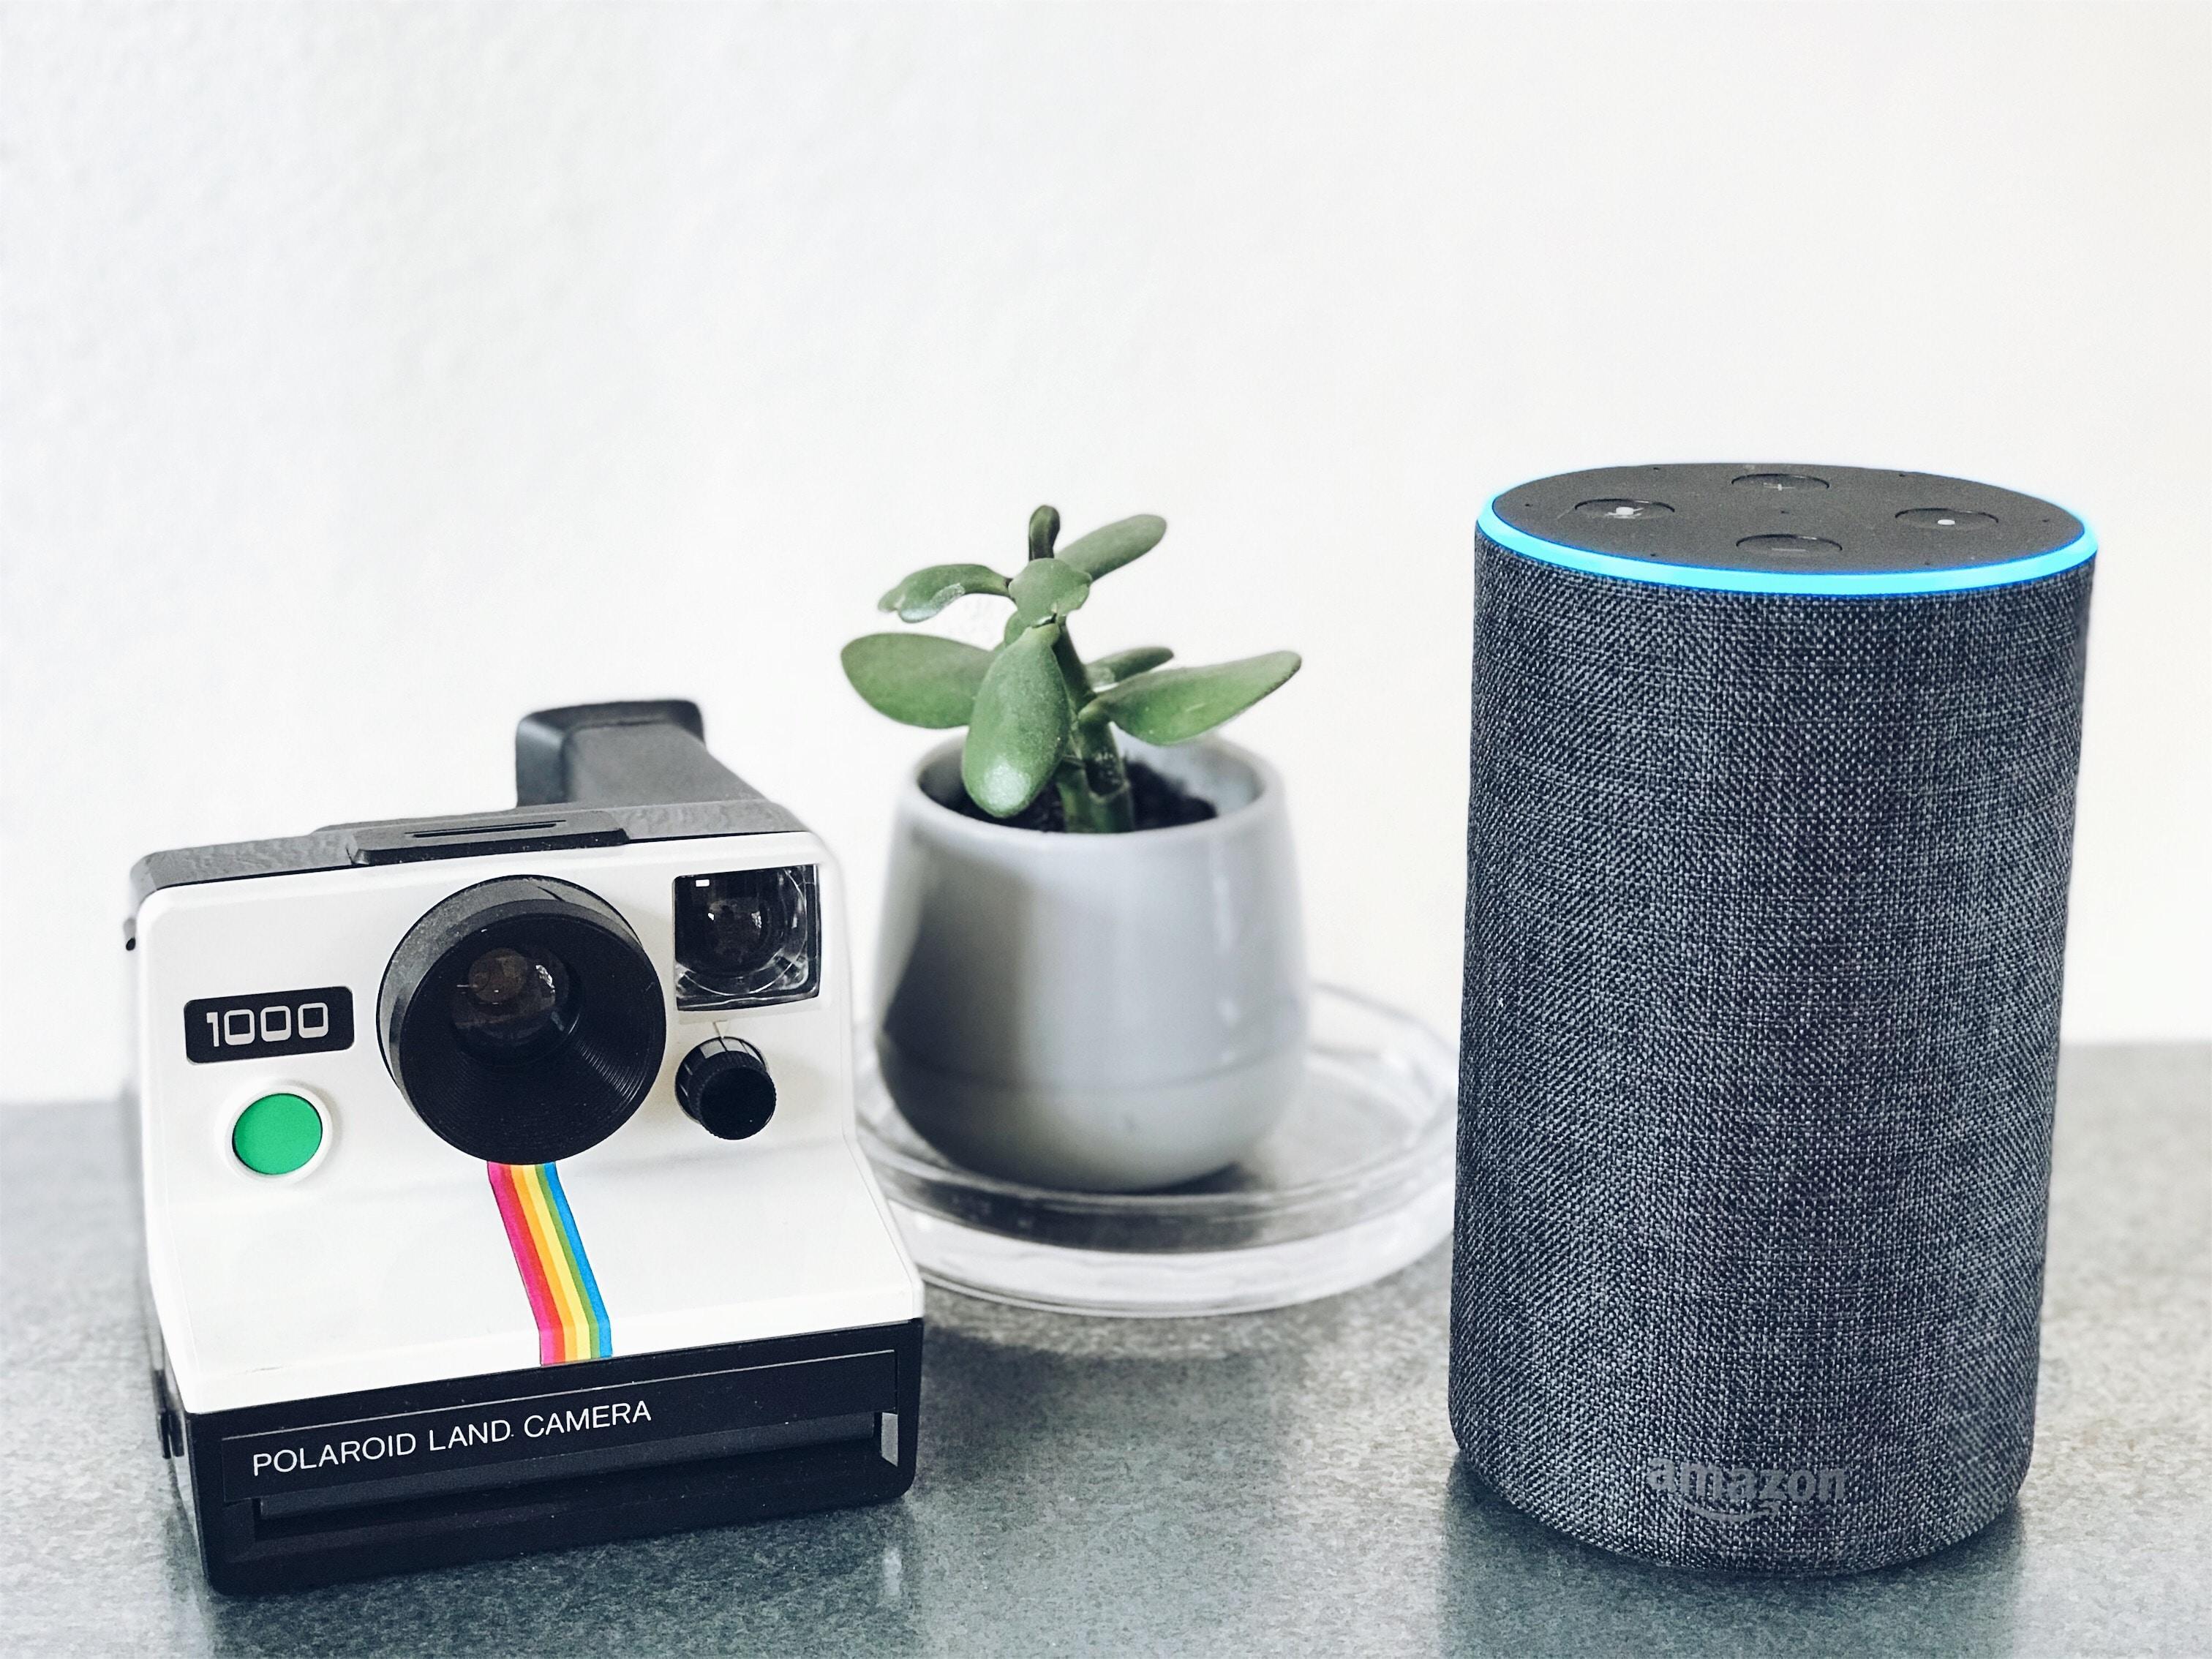 white and black Polaroid land camera and gray Amazon speaker